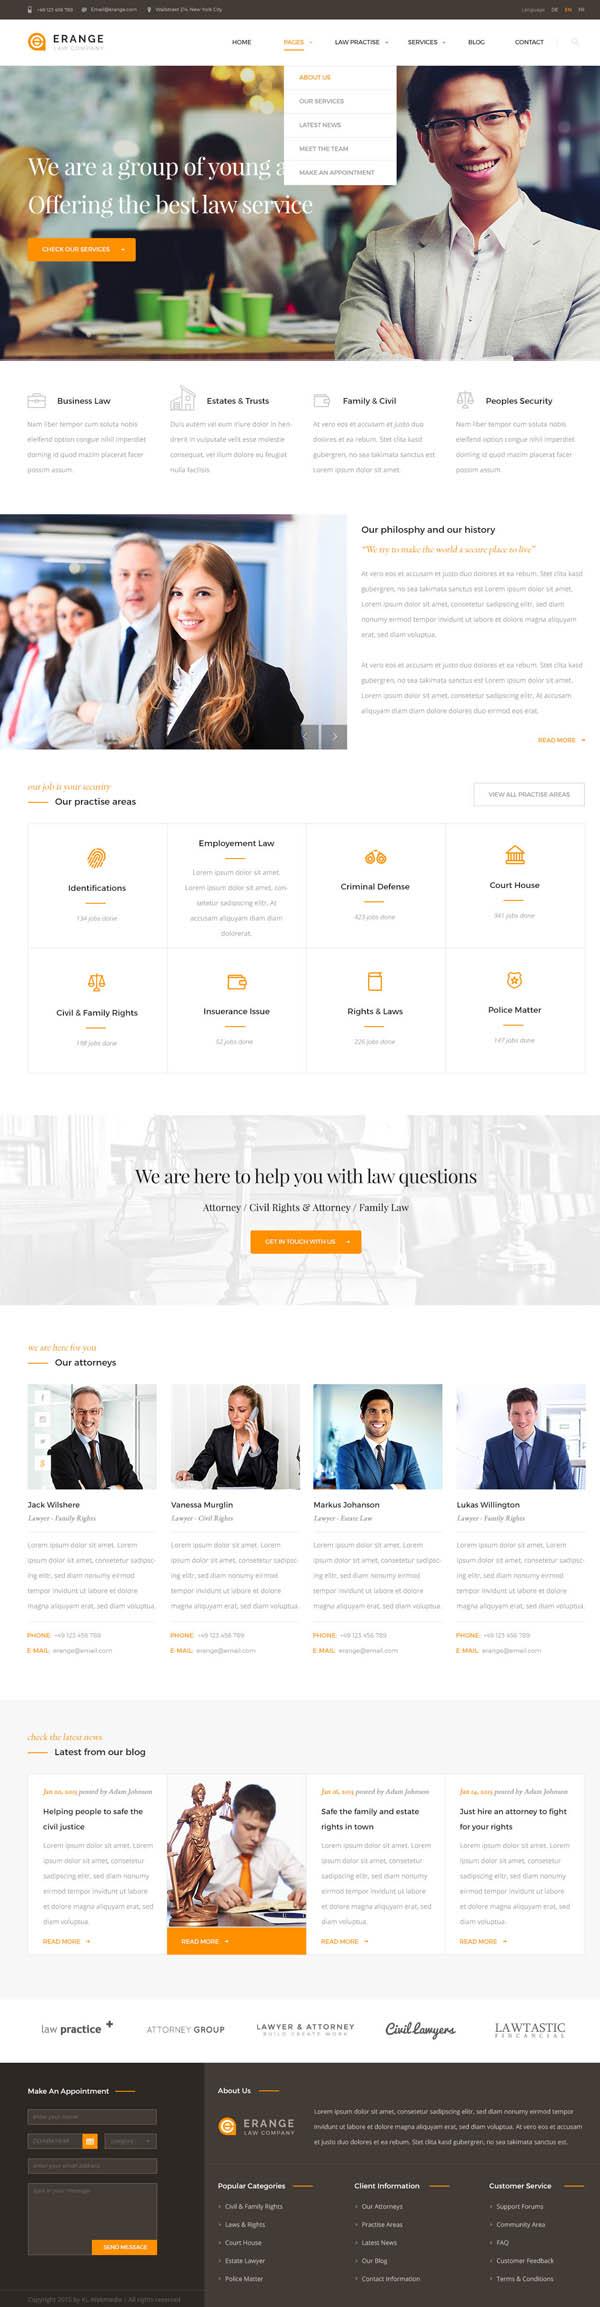 Erange- Responsive HTML Template for Law Firm